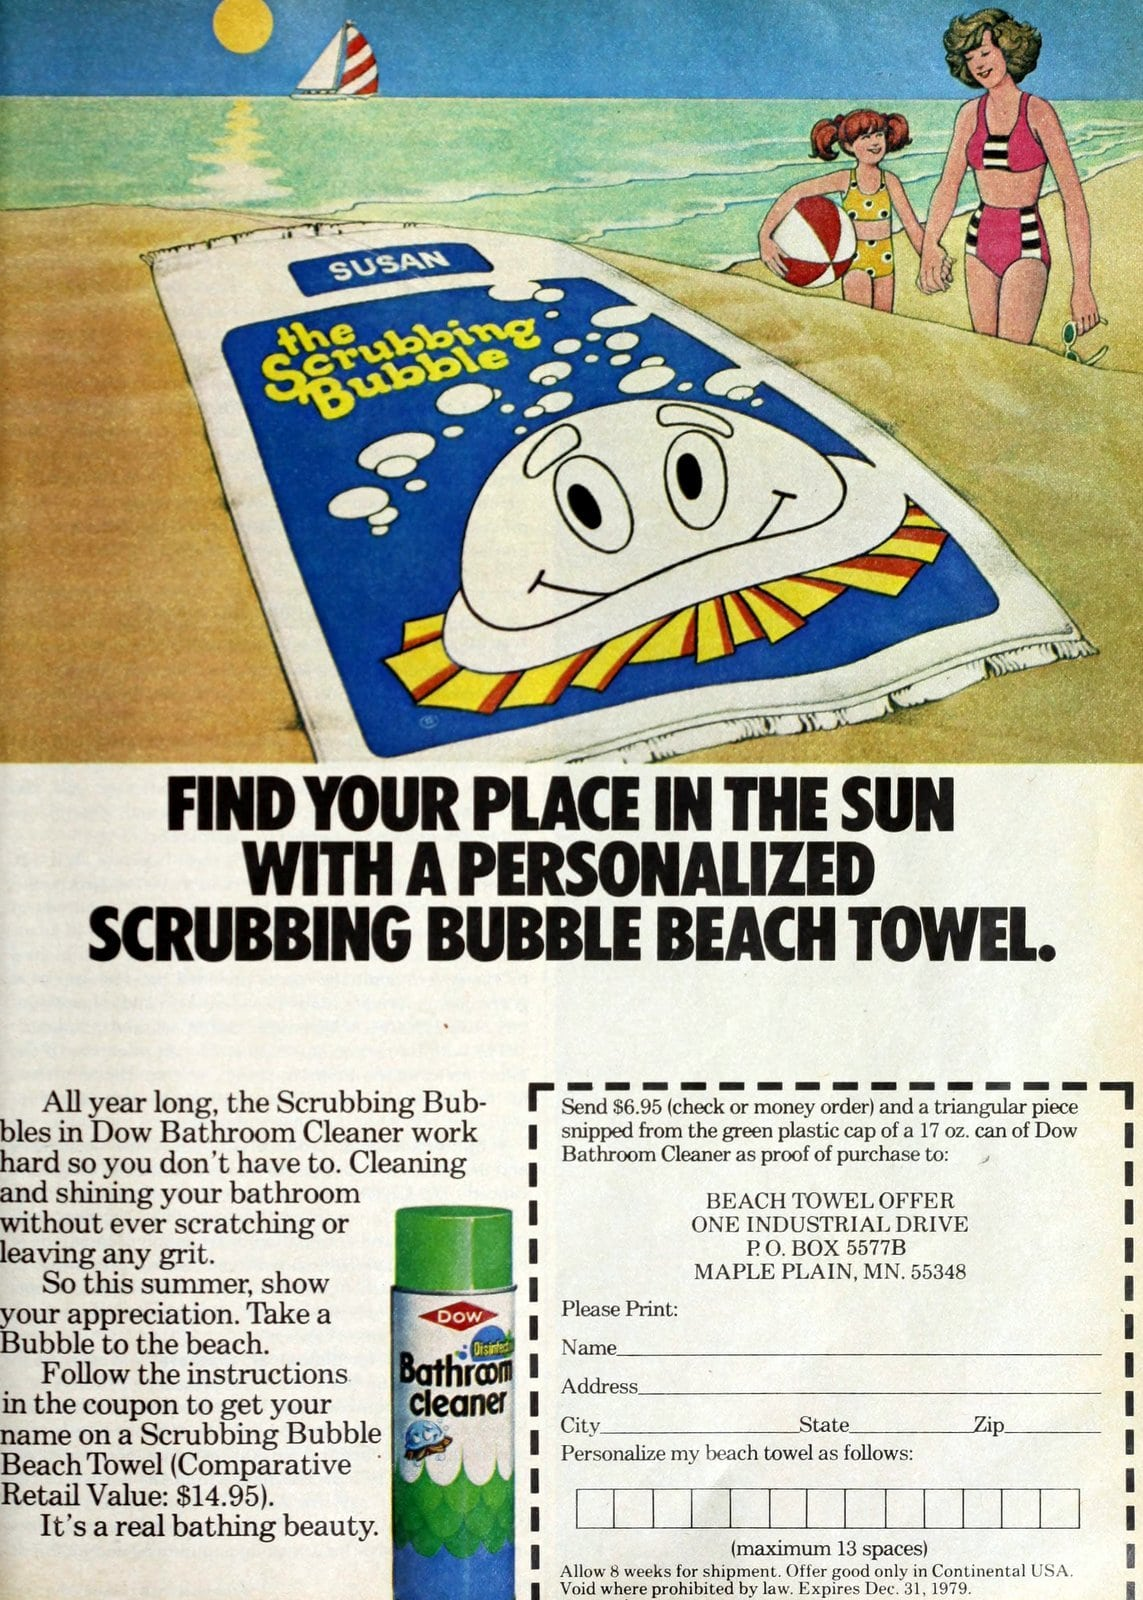 Retro Scrubbing Bubbles bathroom cleaner beach towel (1979)